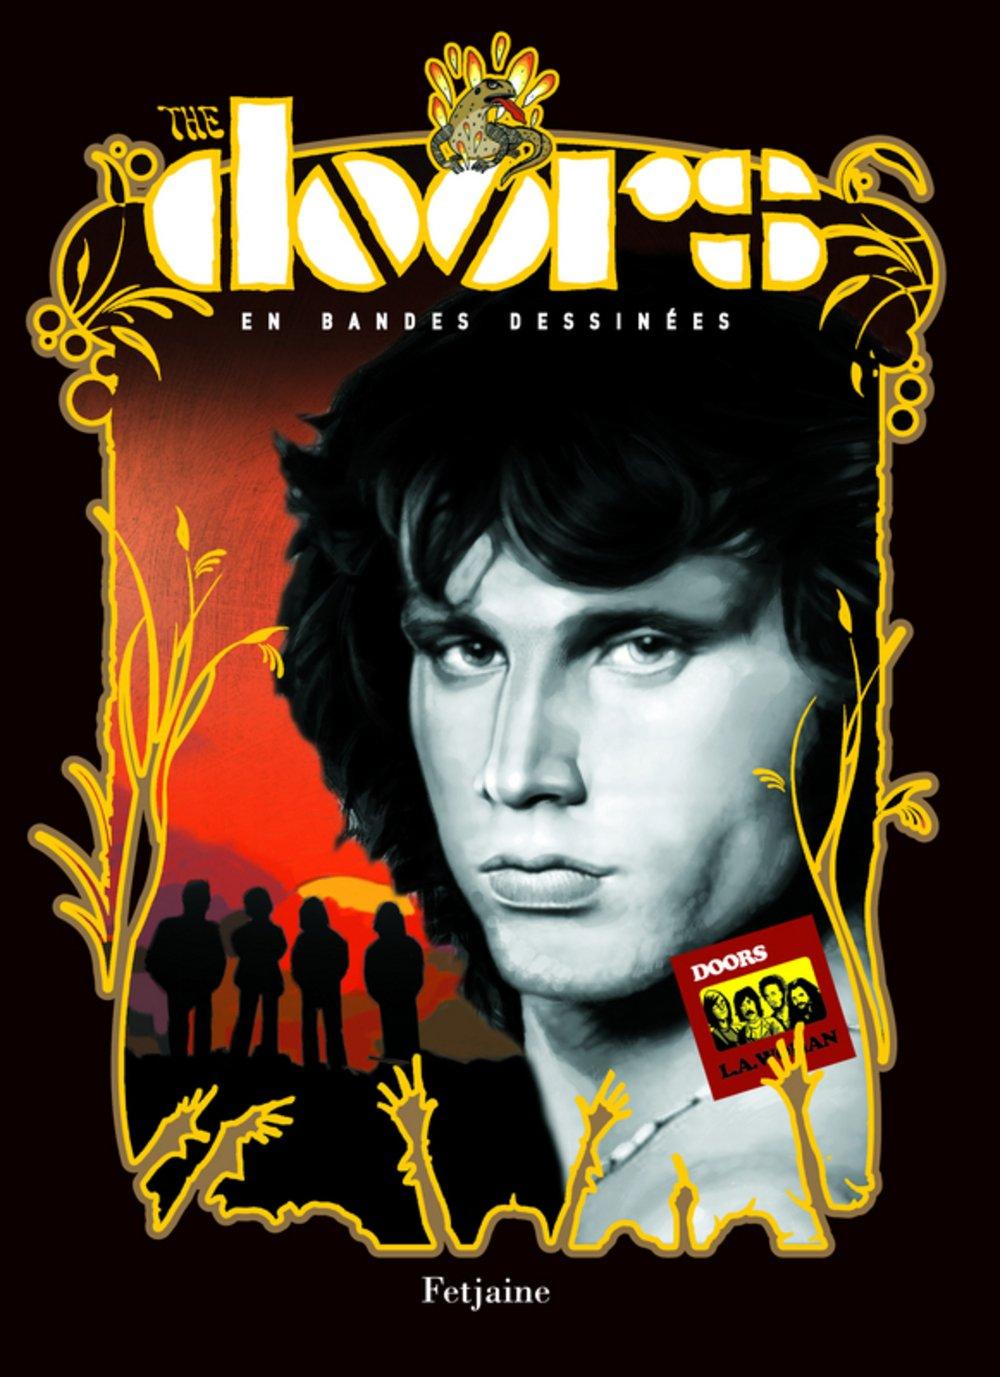 The Doors en bande dessinées